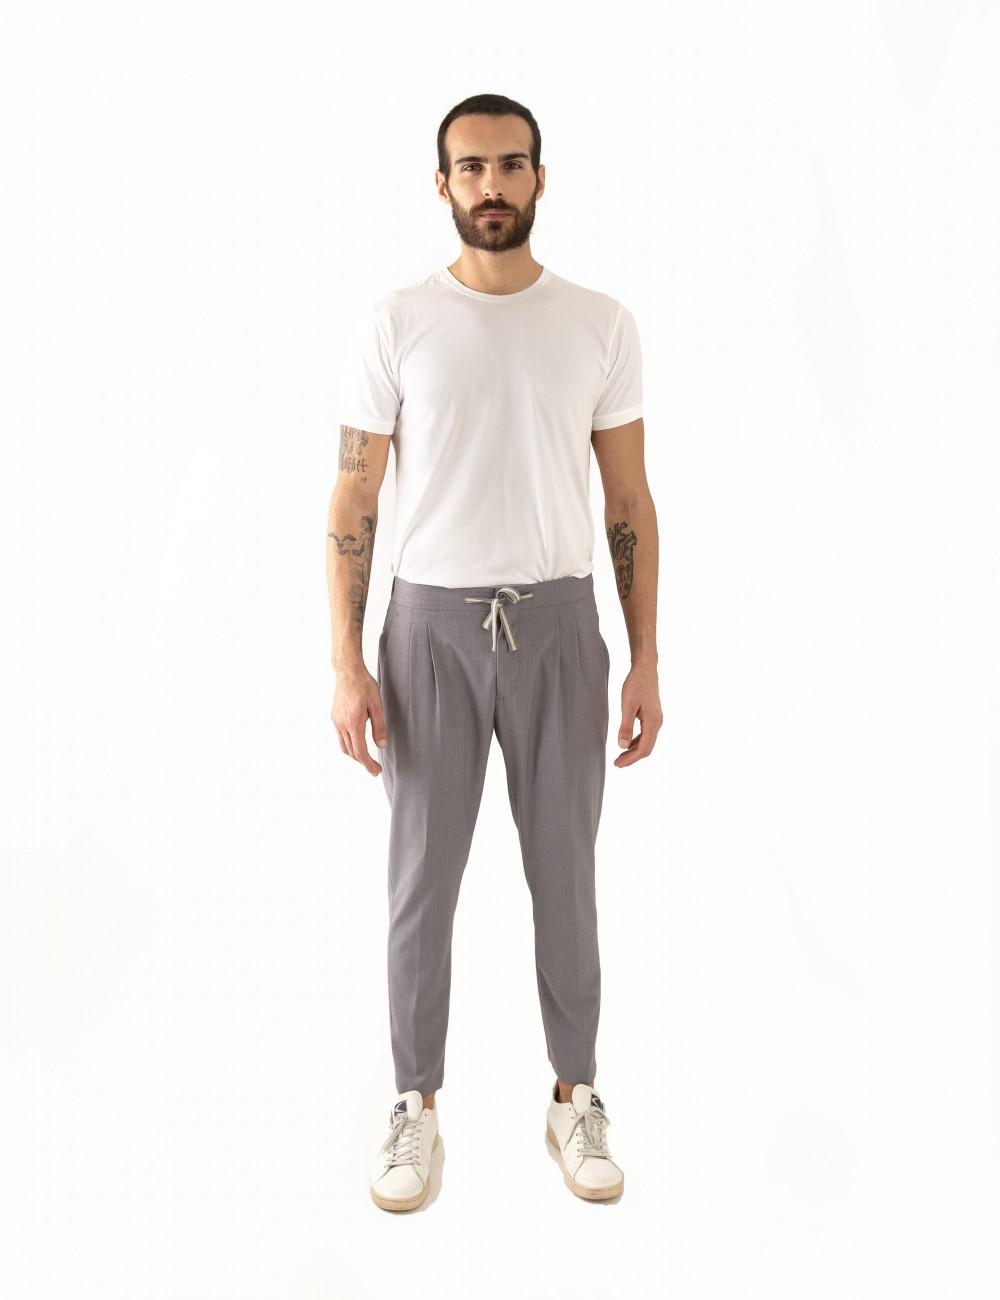 Pantaloni Ali mod.Partenope n.25 grigio indossato frontale